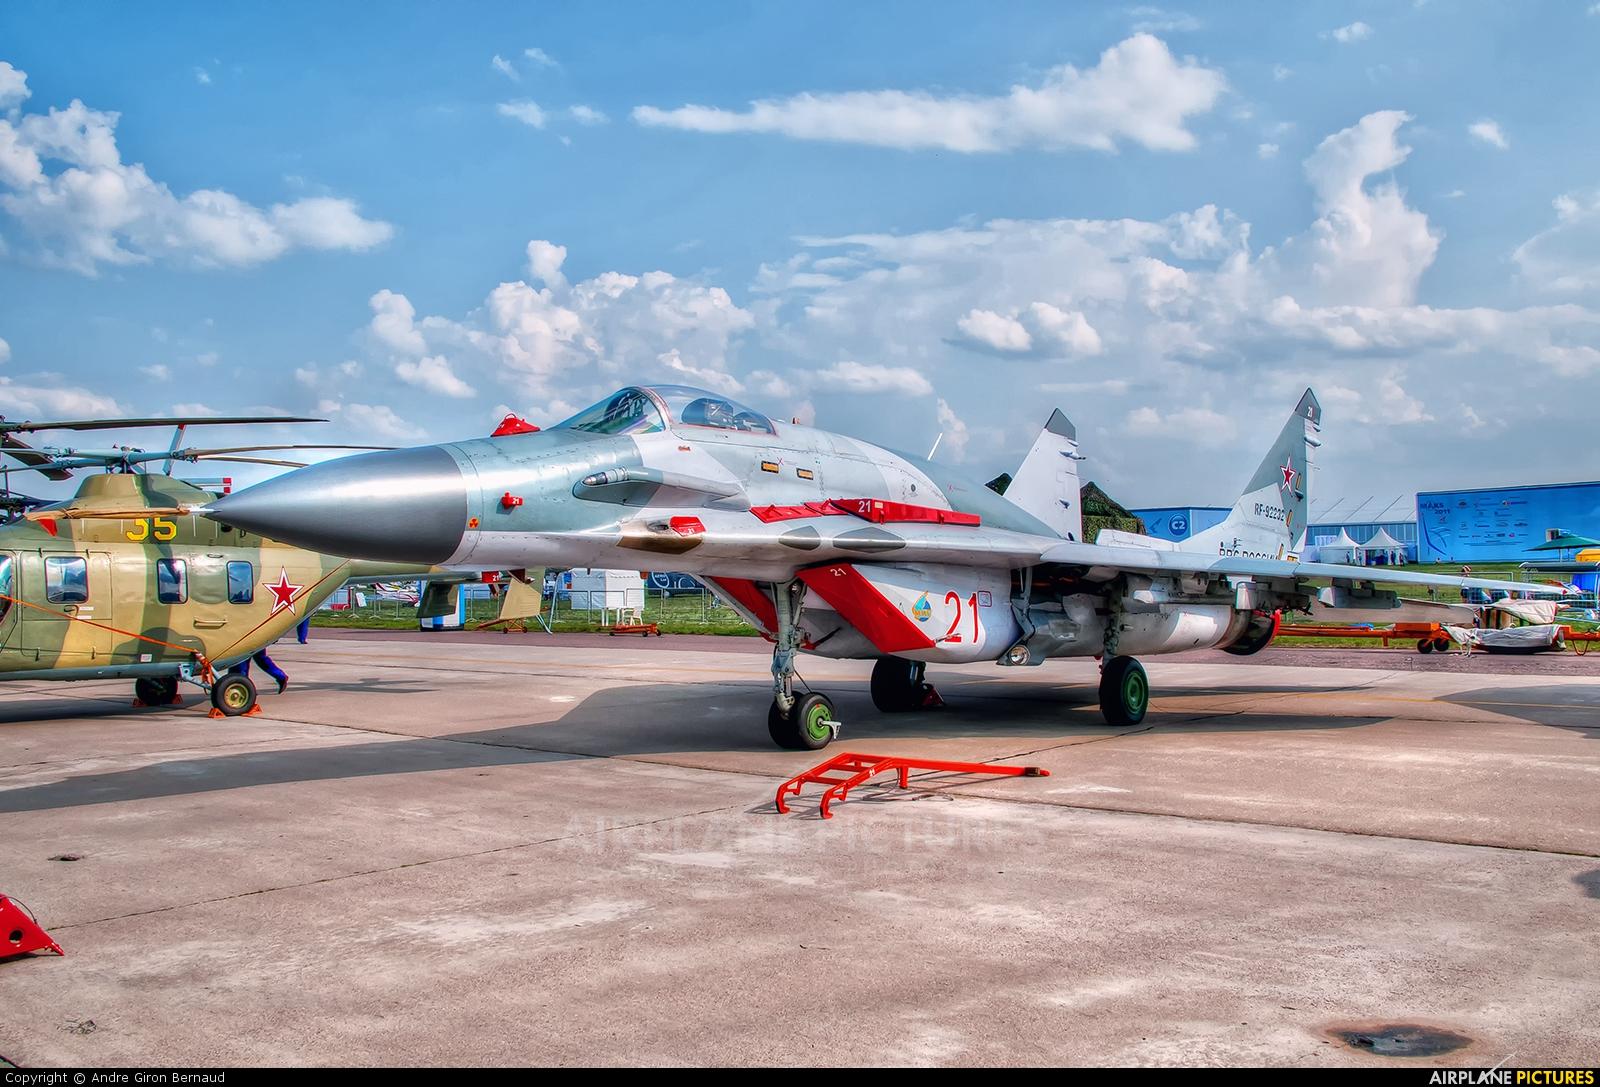 Russia - Air Force 21 aircraft at Ramenskoye - Zhukovsky